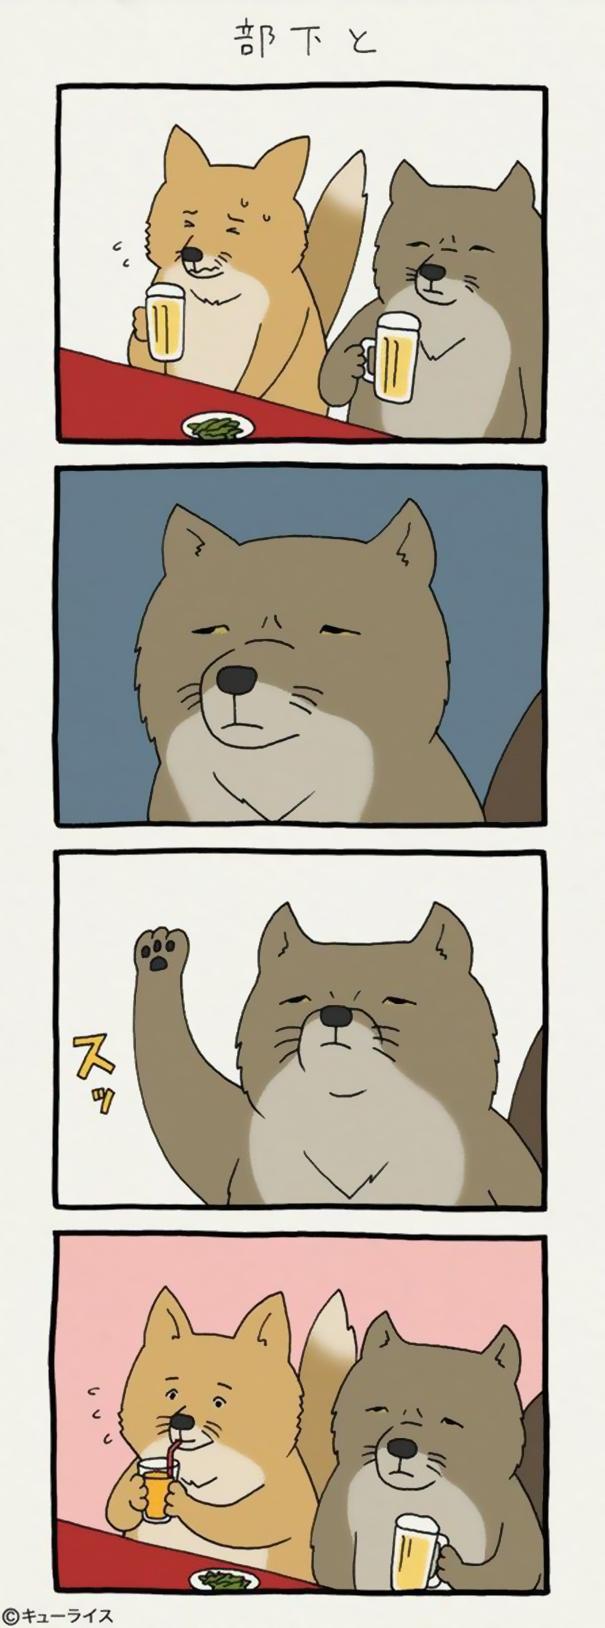 dog cartoon comics qrais japan 2 59895b1d7090d  605 - 우울한 당신을 웃게 해줄 '착한 티벳 여우' 4컷 만화